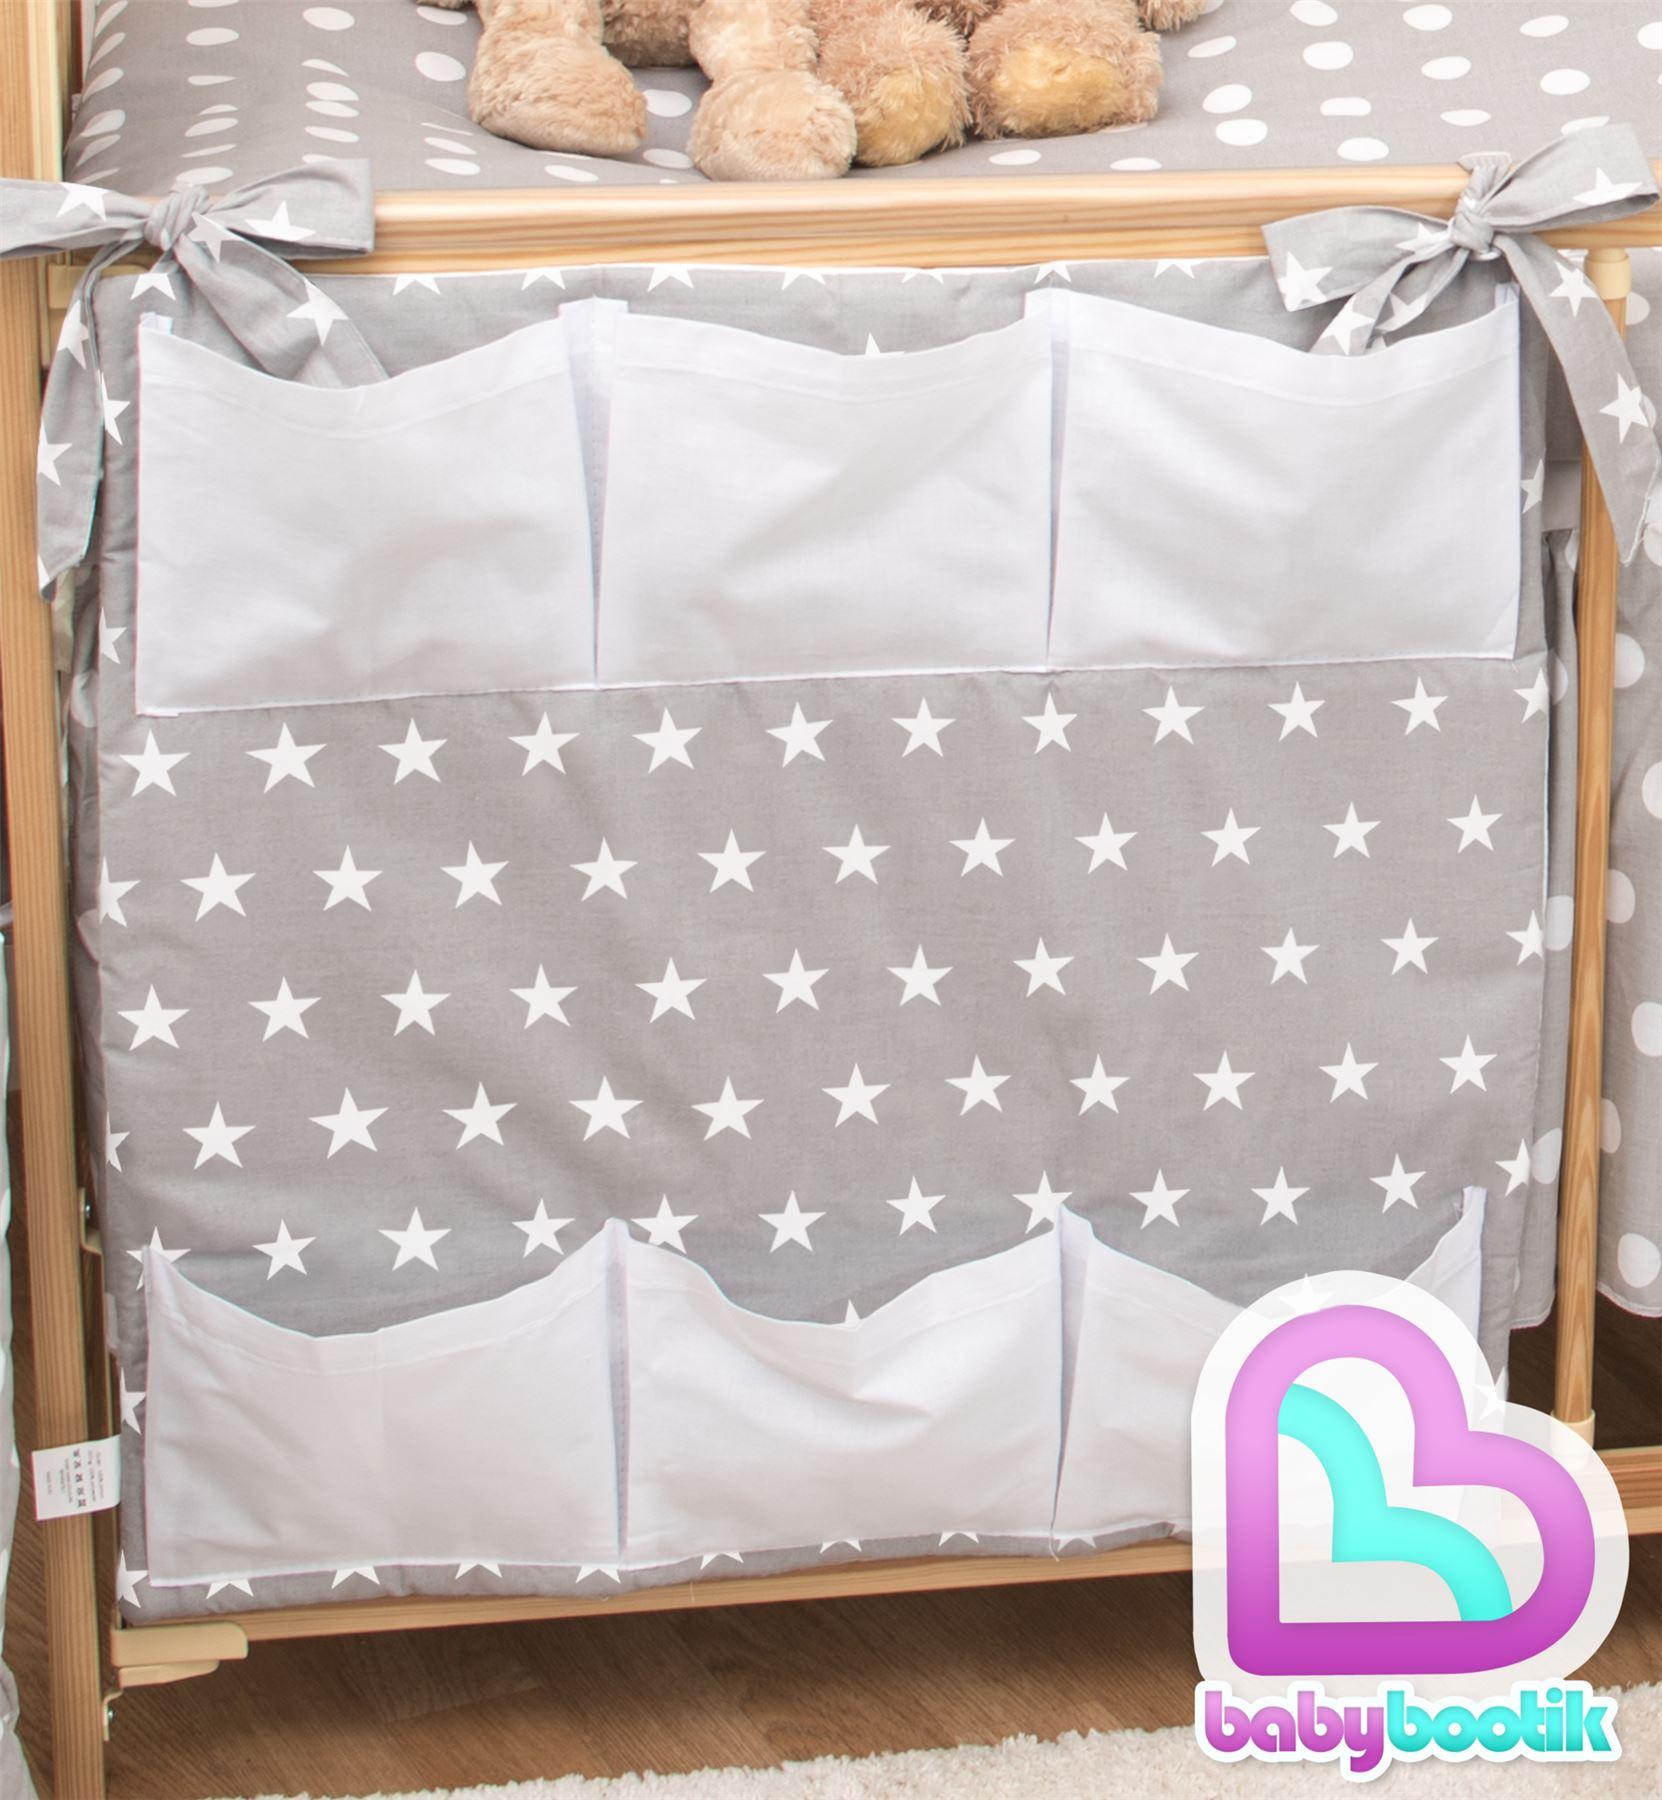 kinderzimmer baby krippe ordentlich organizer f r gitterbett kinderbett ebay. Black Bedroom Furniture Sets. Home Design Ideas